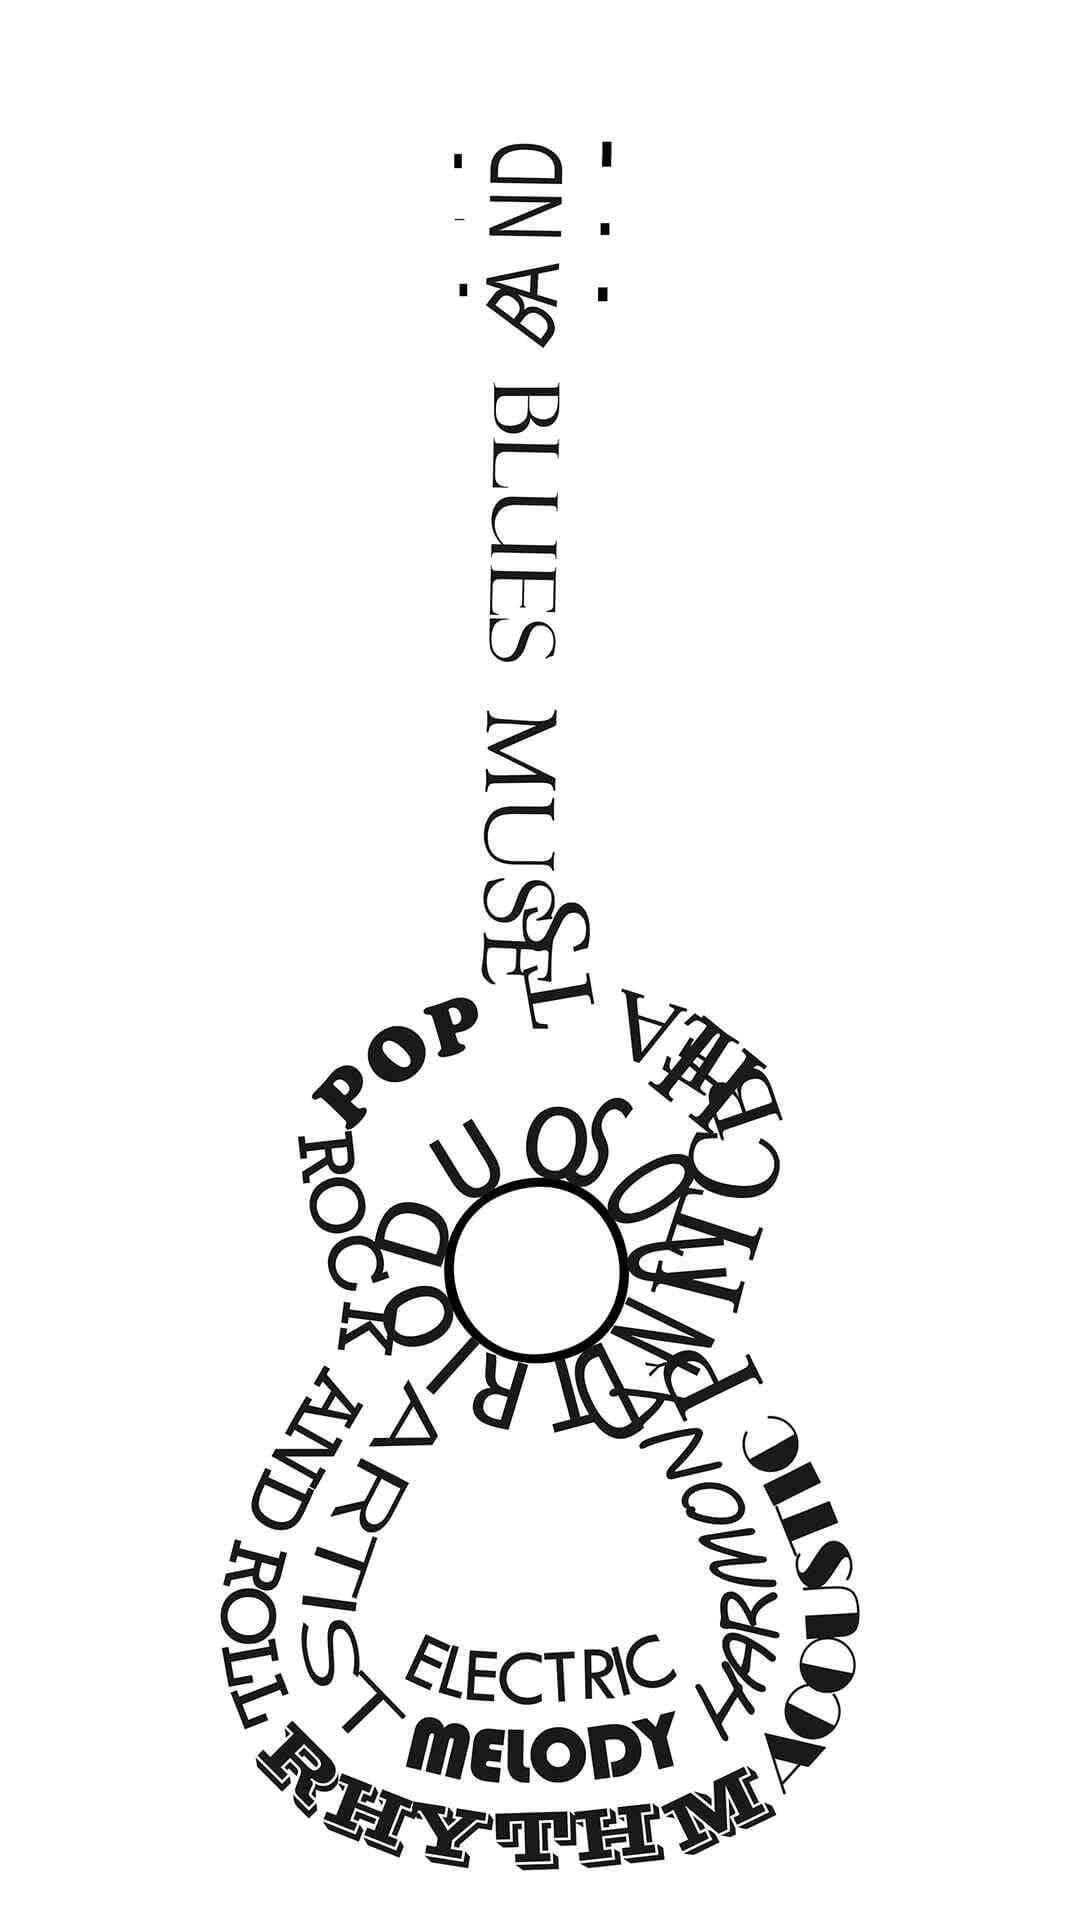 typograhy-guitar